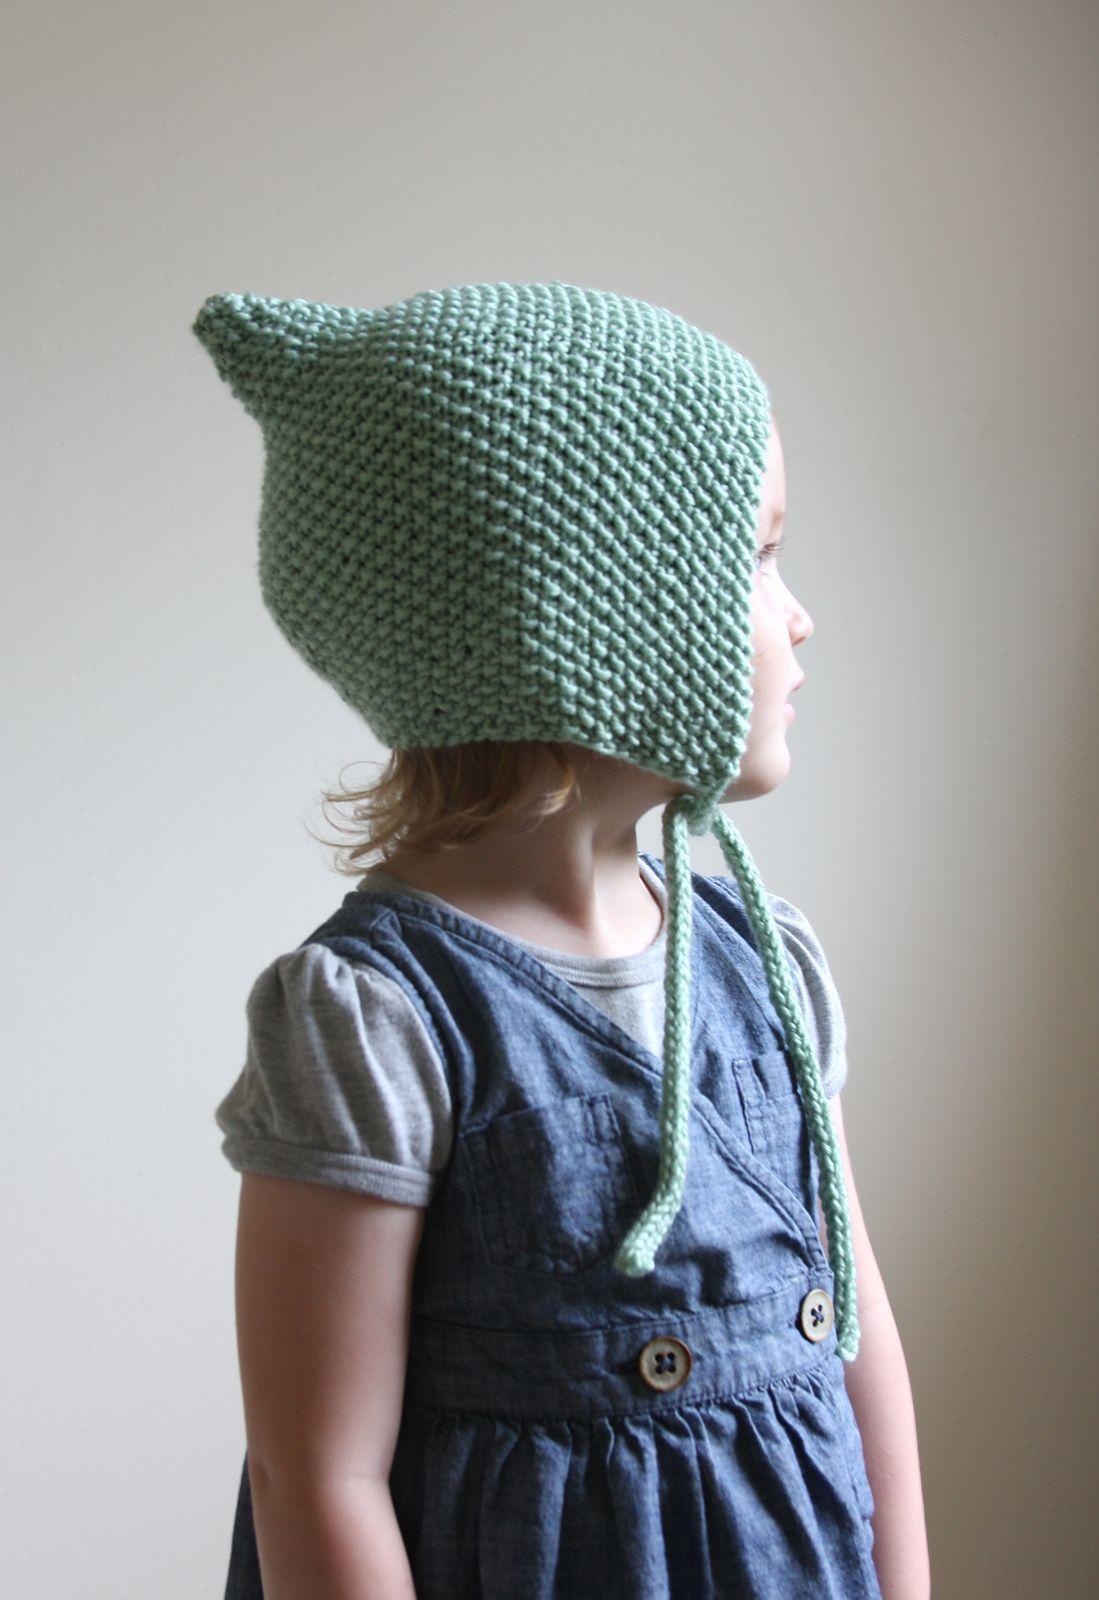 Knit Beanie Pattern Ravelry : Ravelry: Knit Pixie Bonnet Pattern - Baby Bonnet Pattern - Hat Pattern - Knit...